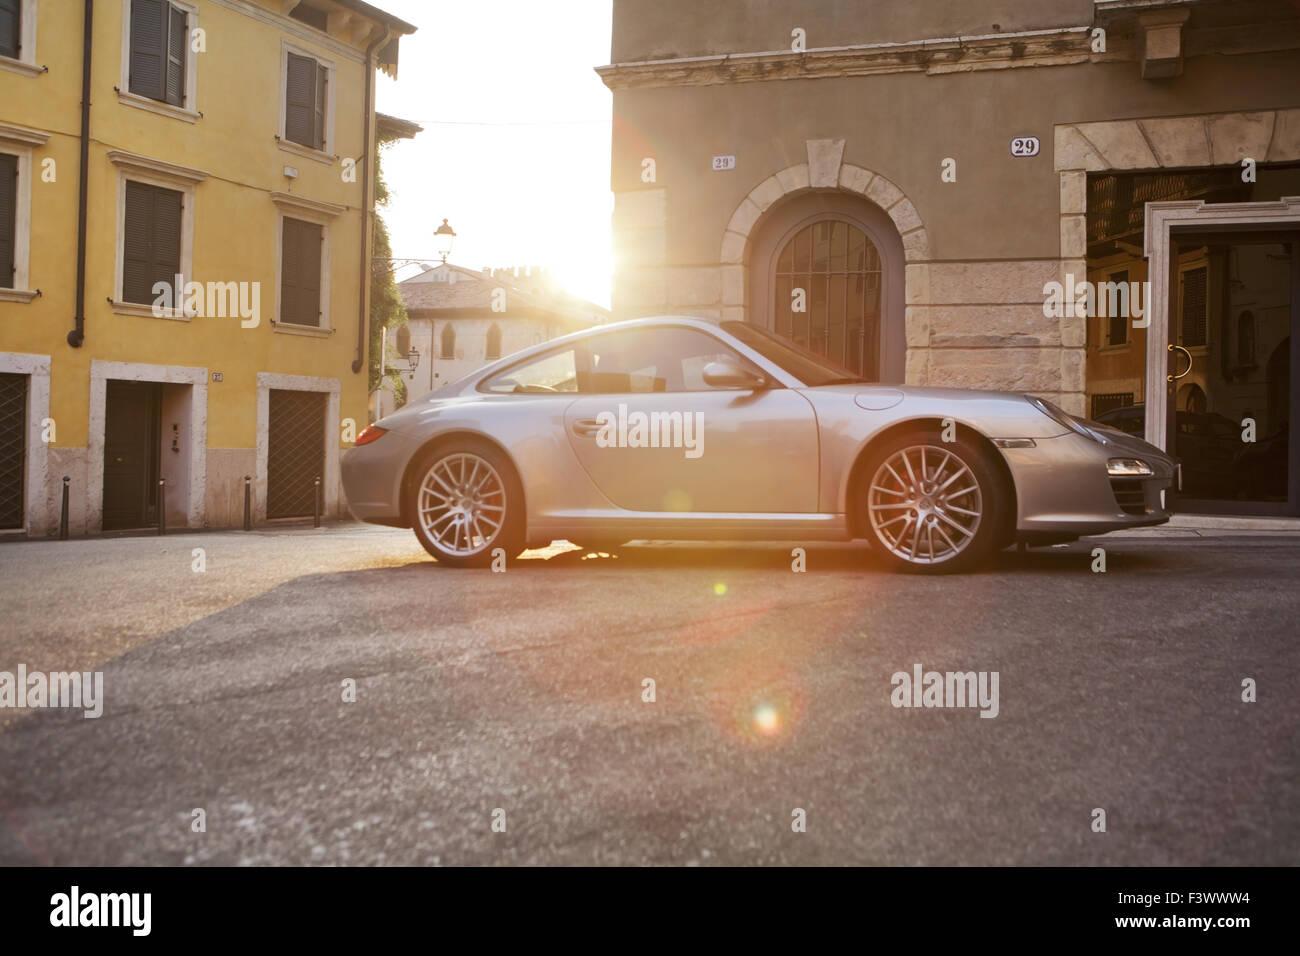 car - Stock Image